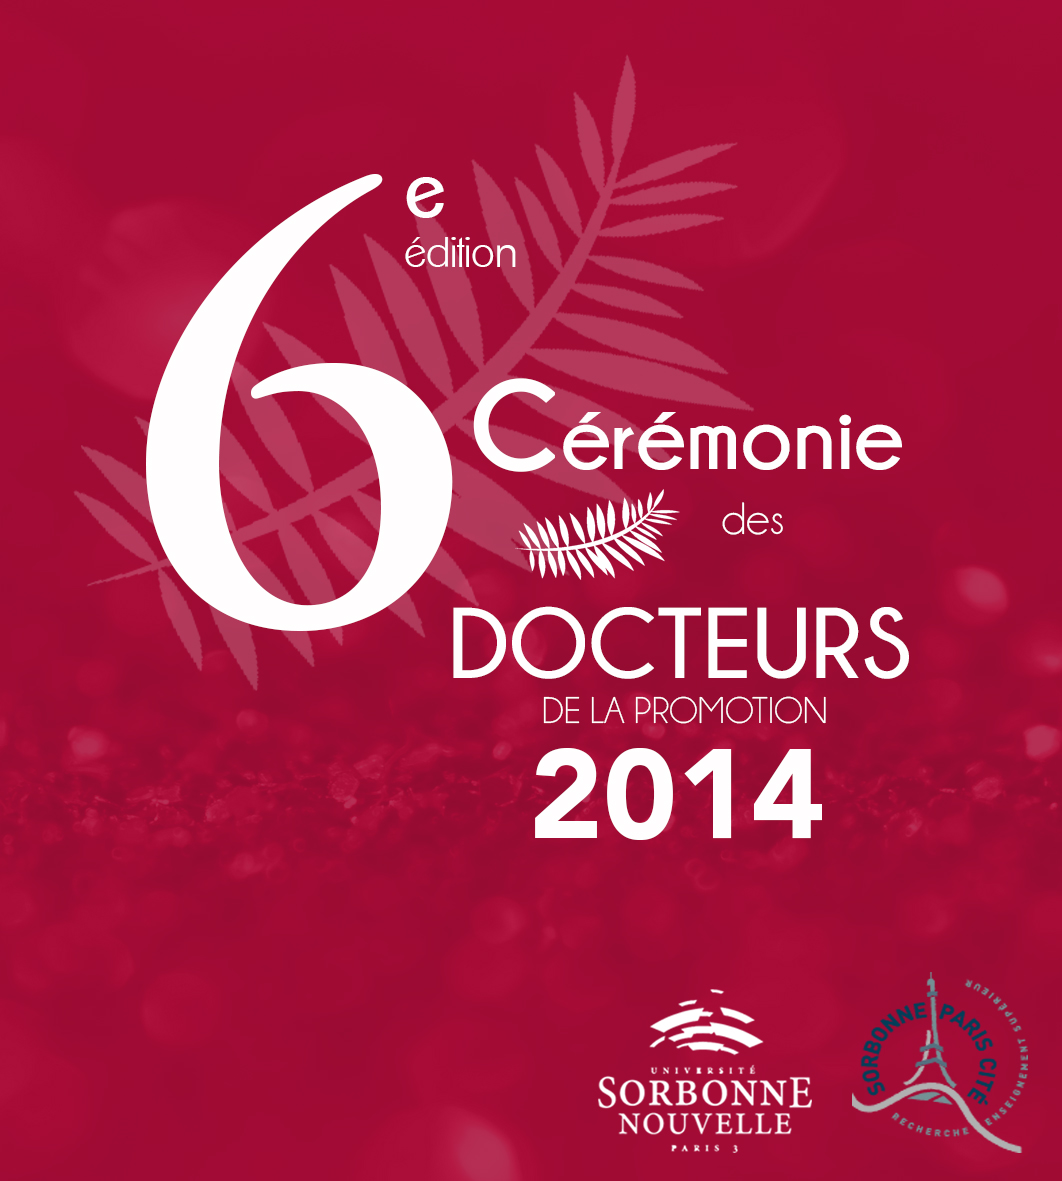 Mini Affiche ceremonie docteurs 2014.jpg